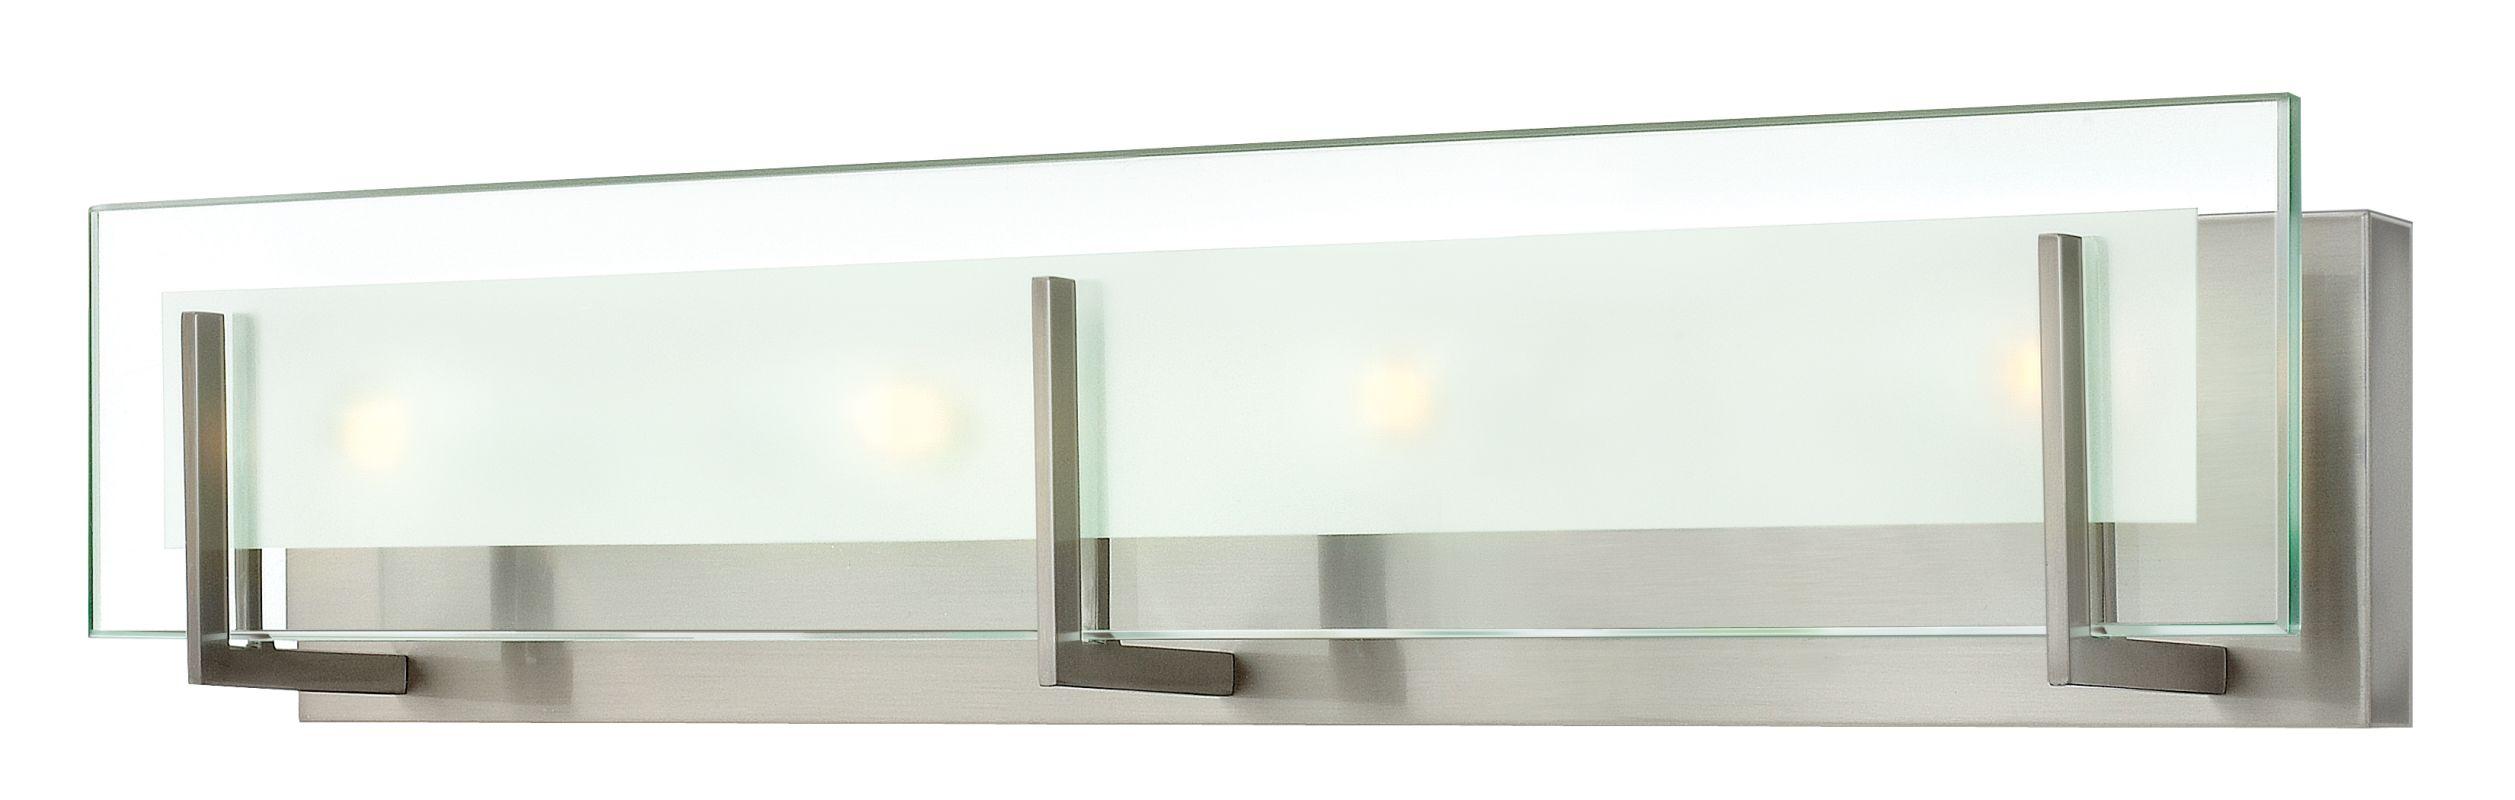 Hinkley 5654BN Brushed Nickel Contemporary Latitude Bathroom Light